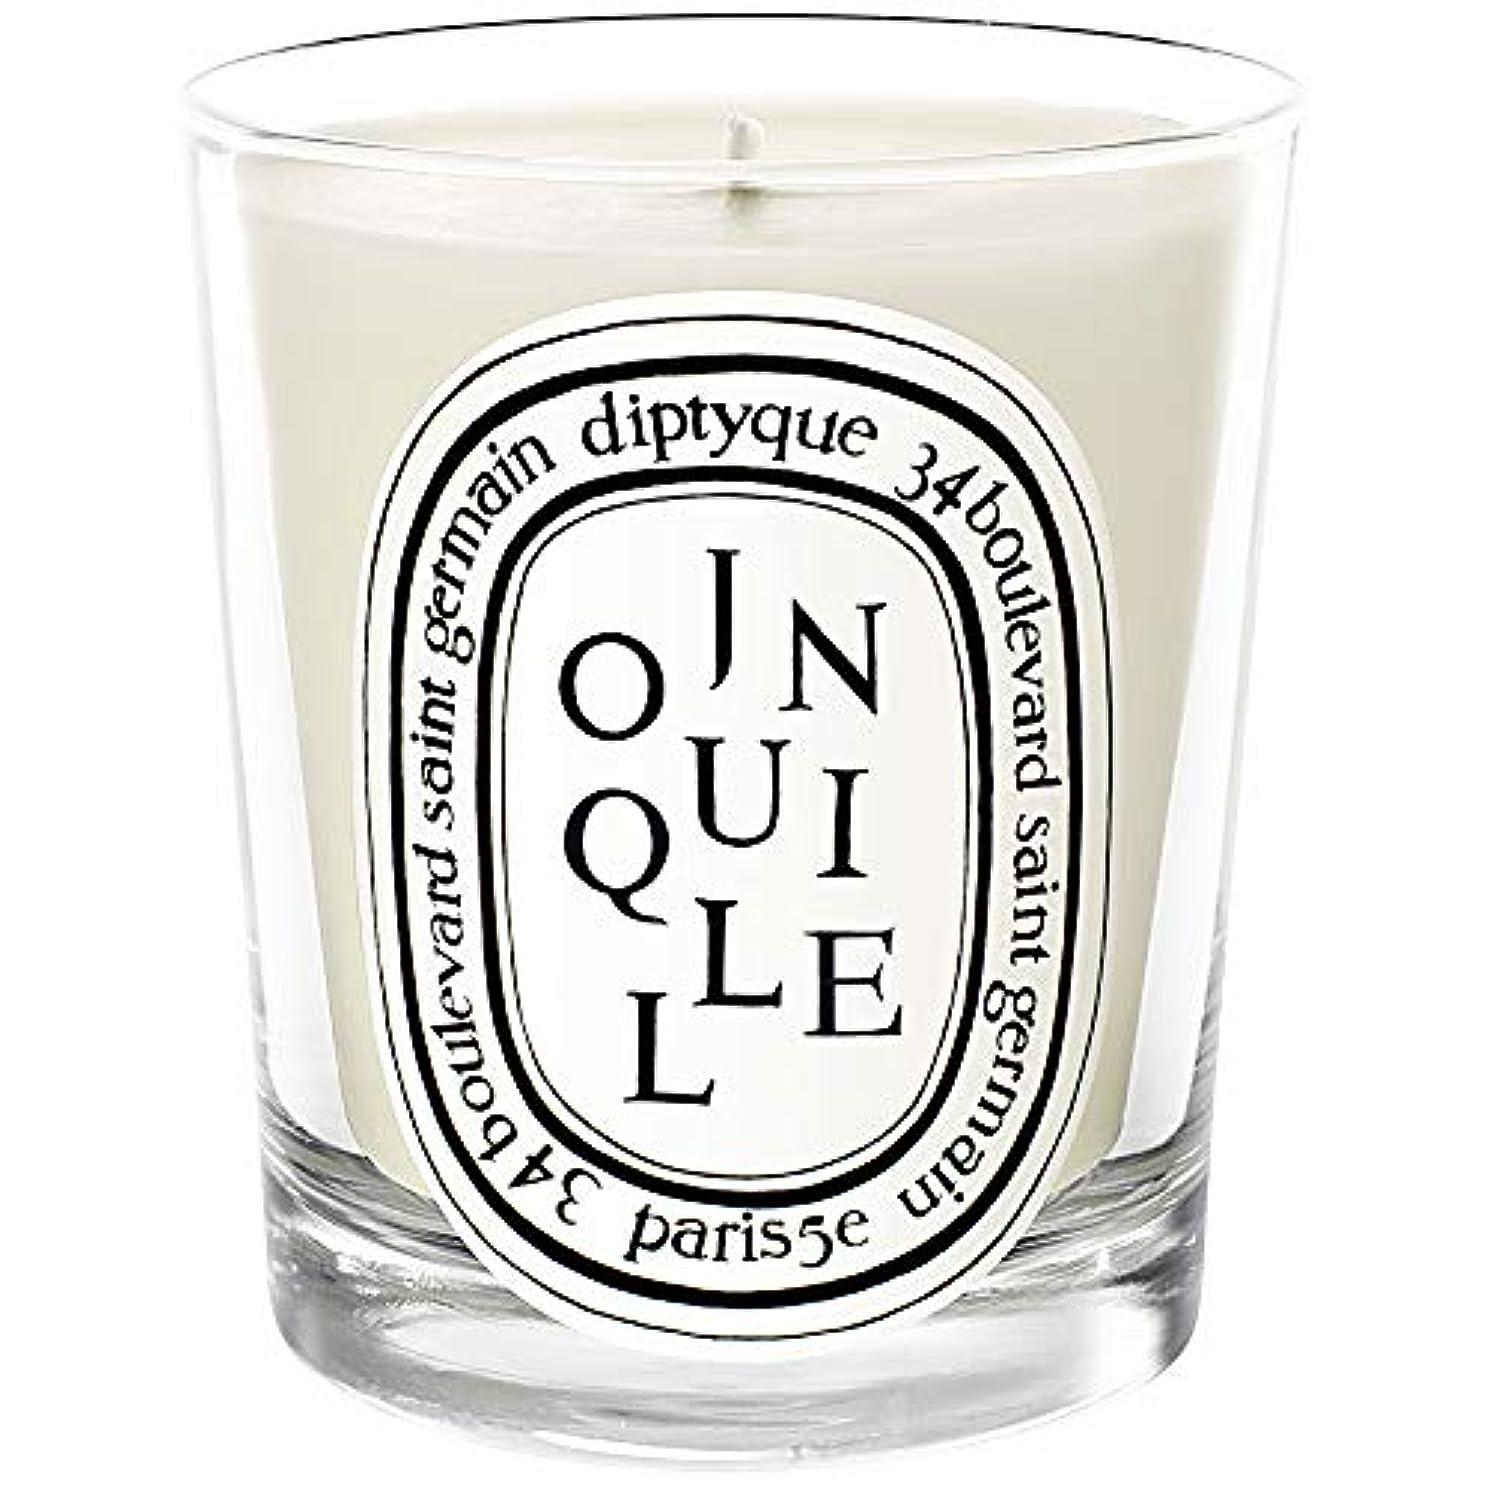 [Diptyque] Diptyque Jonquilleキャンドル190グラム - Diptyque Jonquille Candle 190g [並行輸入品]